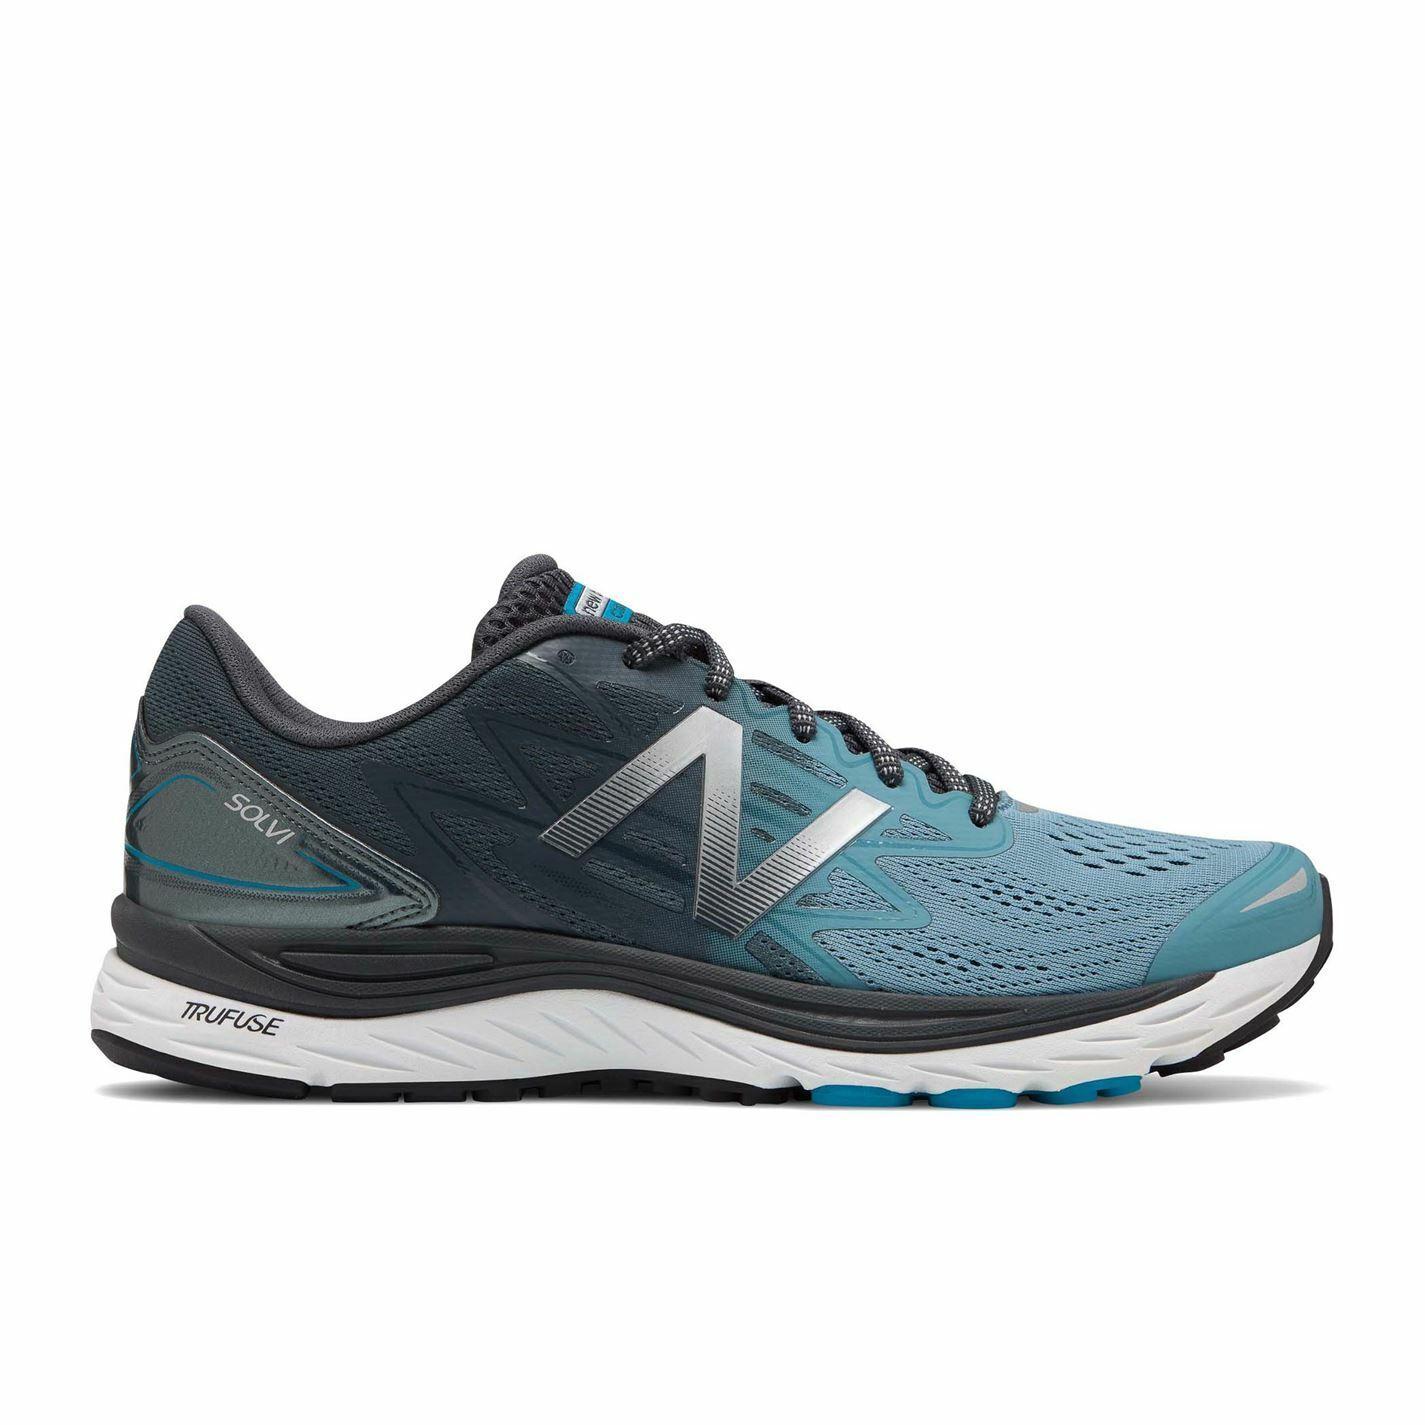 New Balance Solvi Road Running shoes Mens